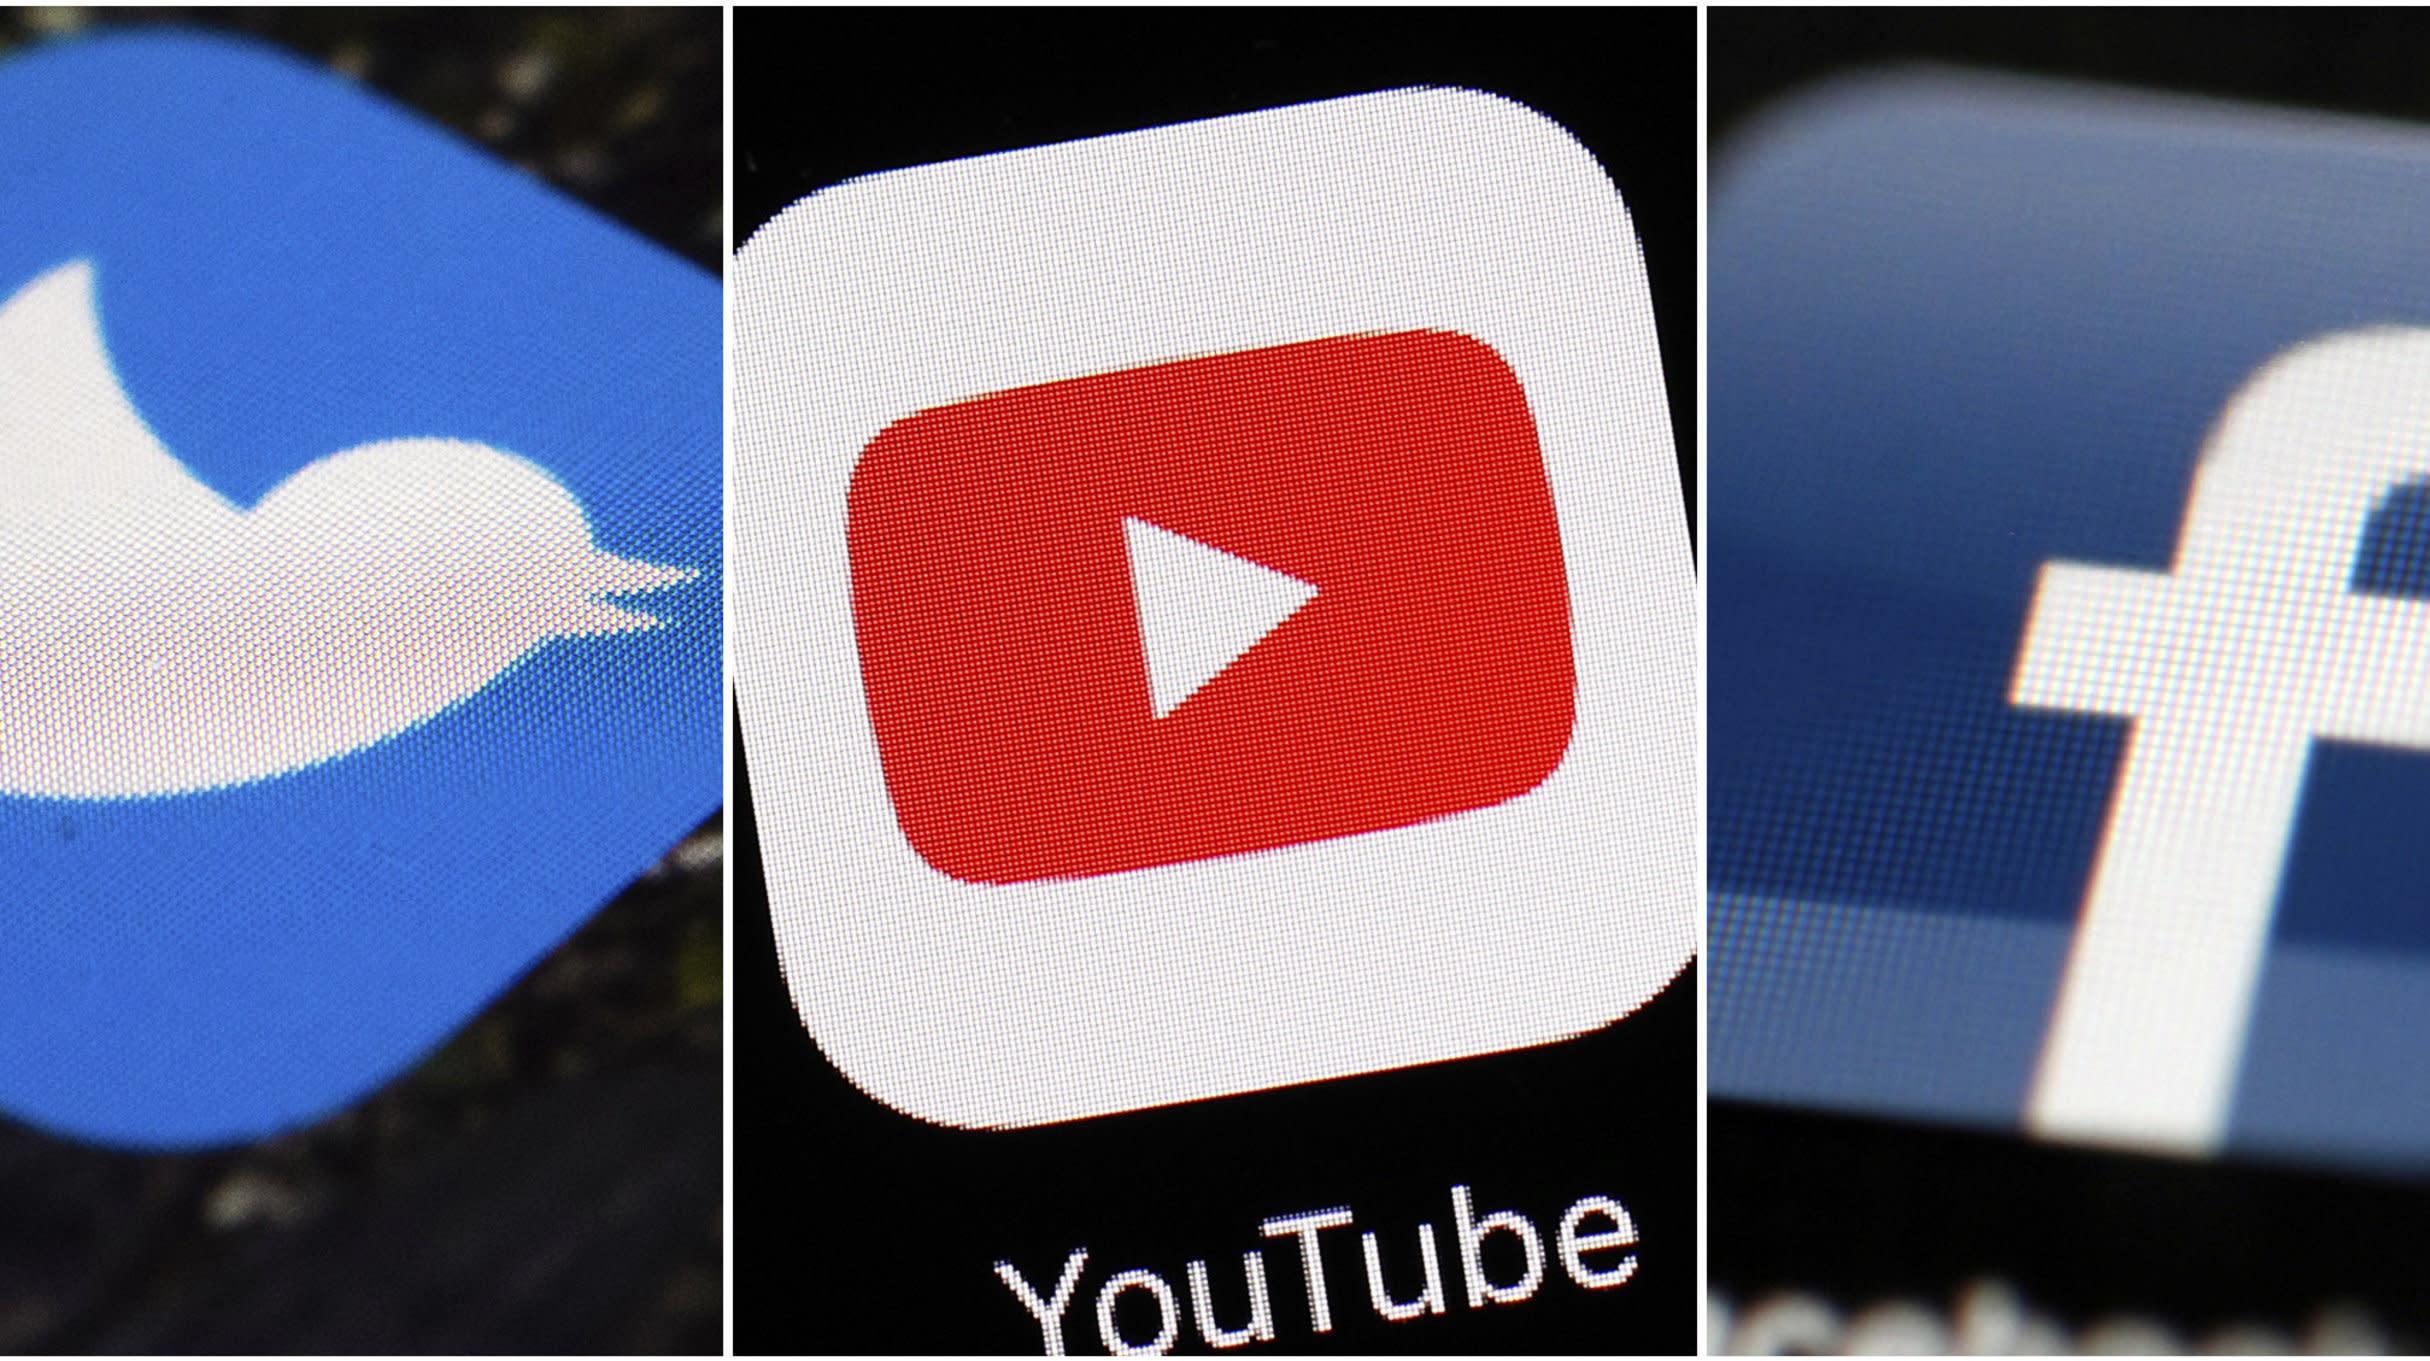 Australia Passes Law Penalizing Social Media Companies For Violent Posts